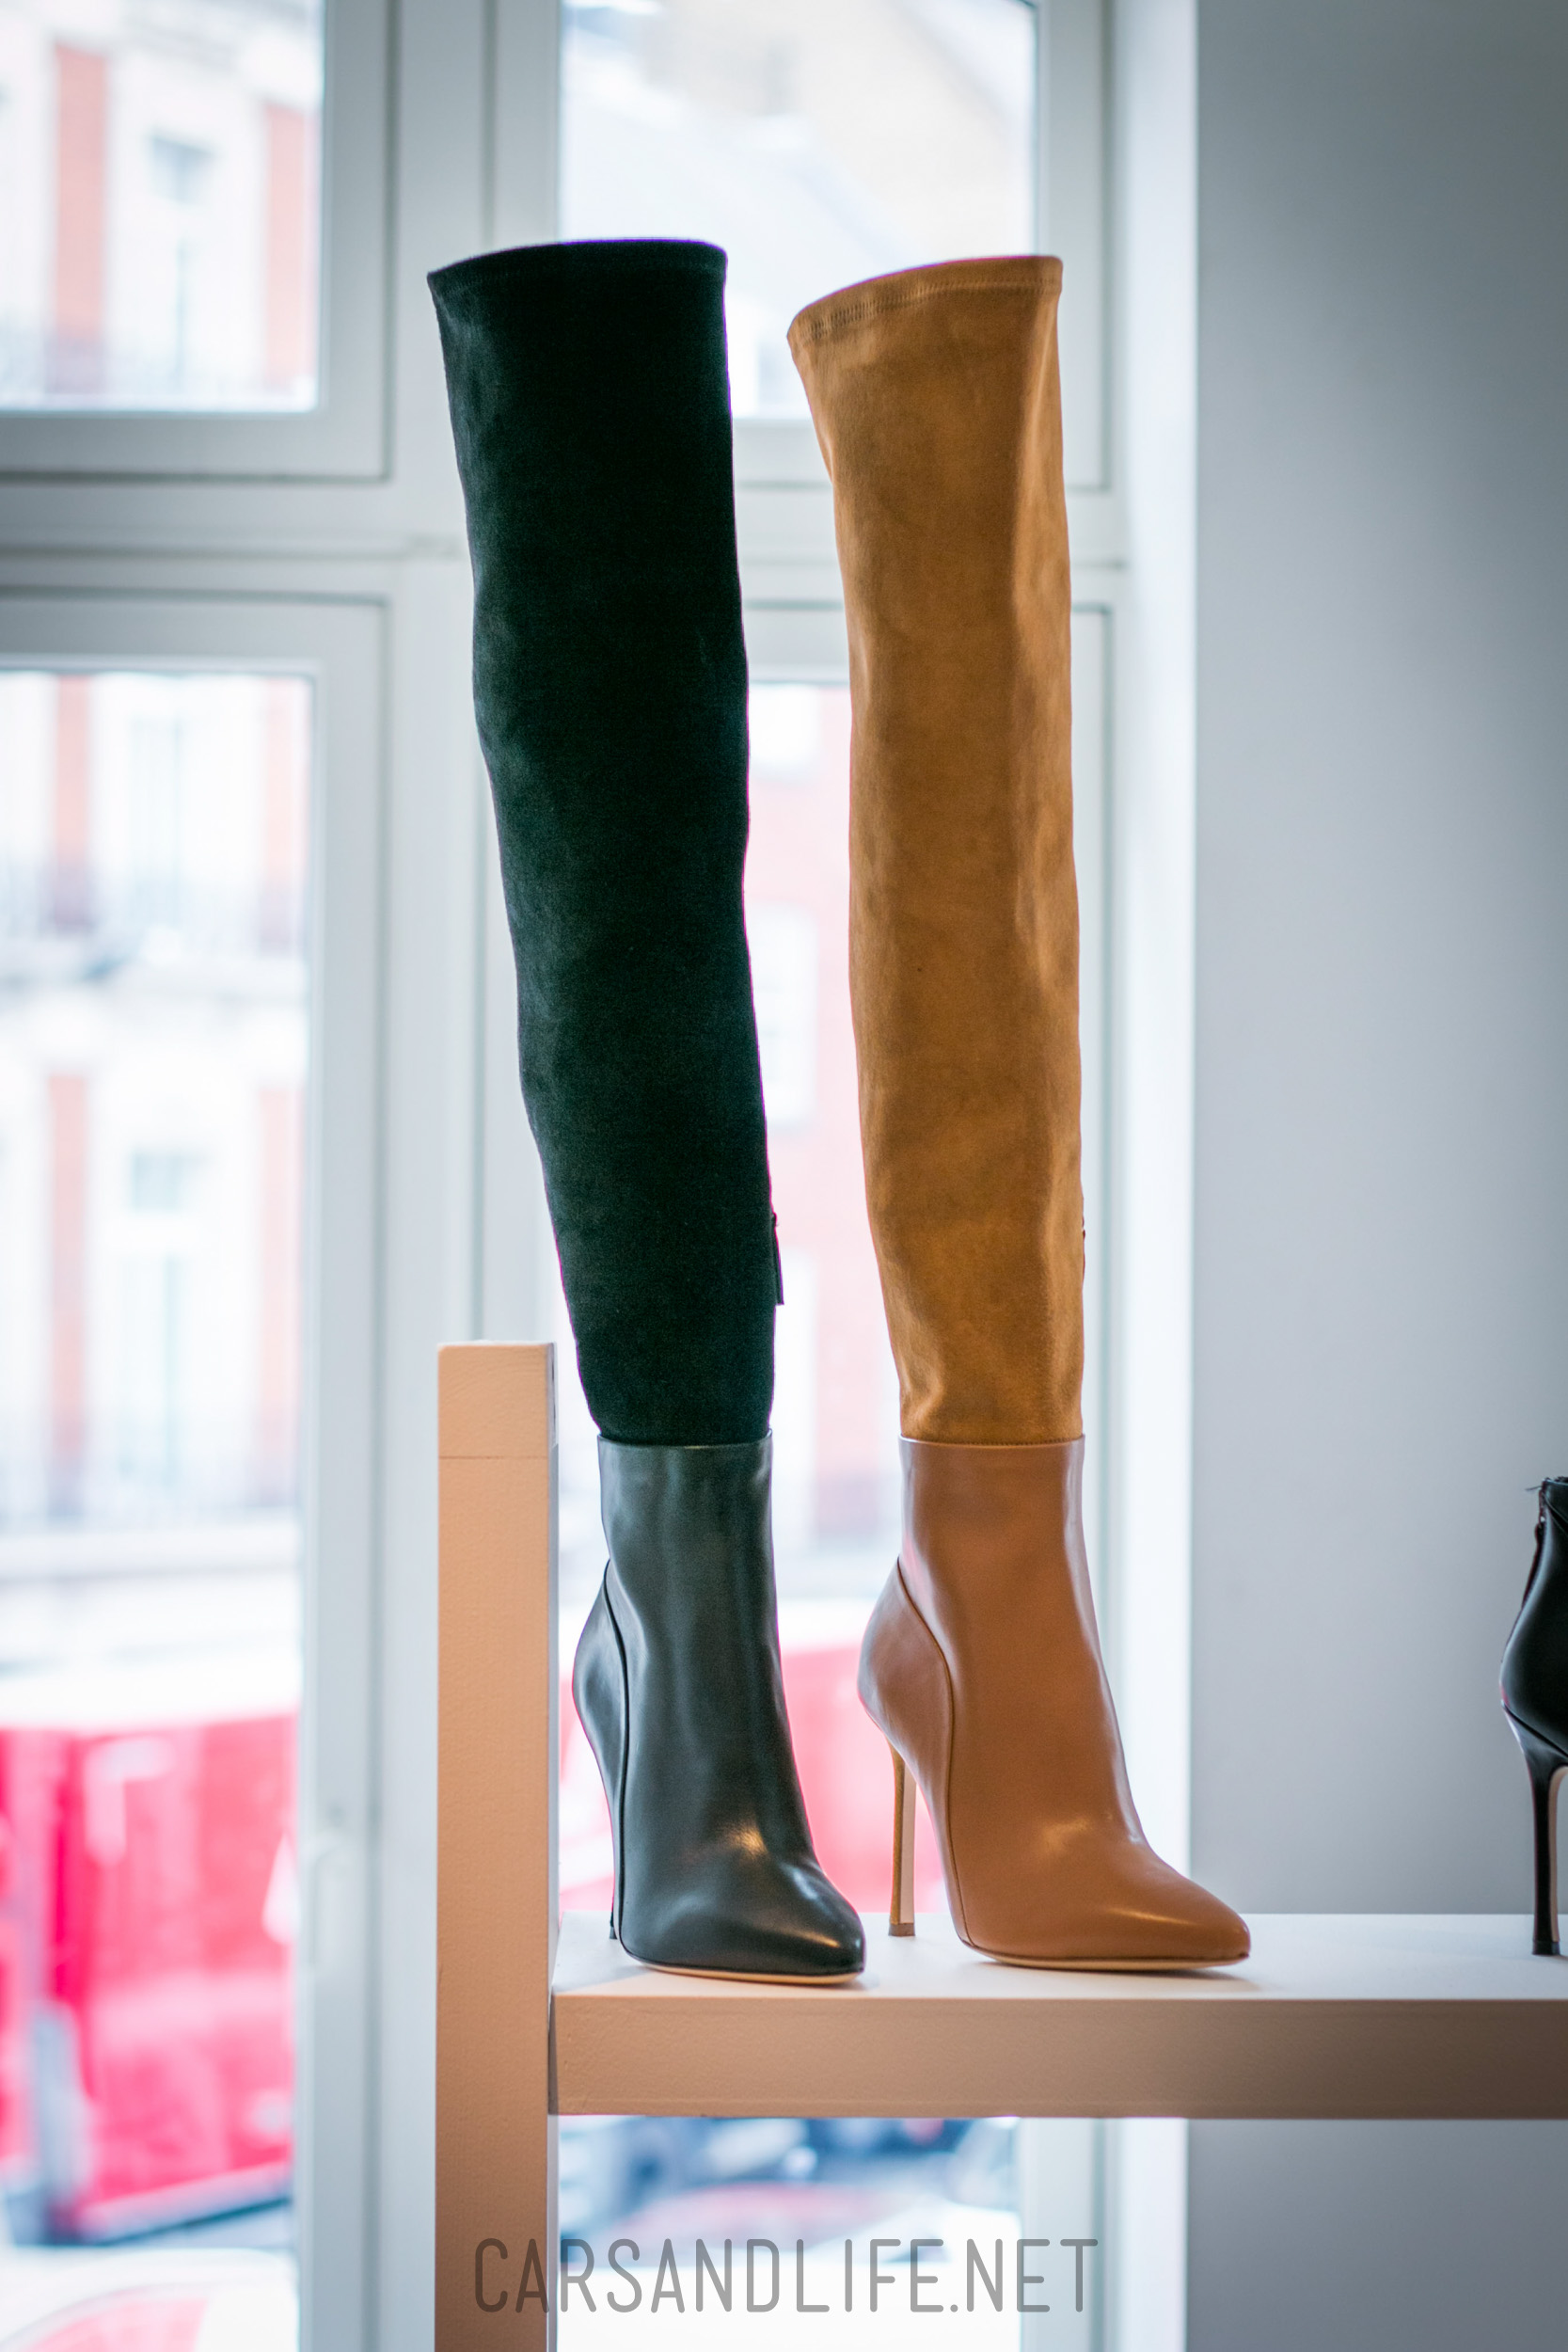 Ferrari California T >> Chelsea Paris High Heels